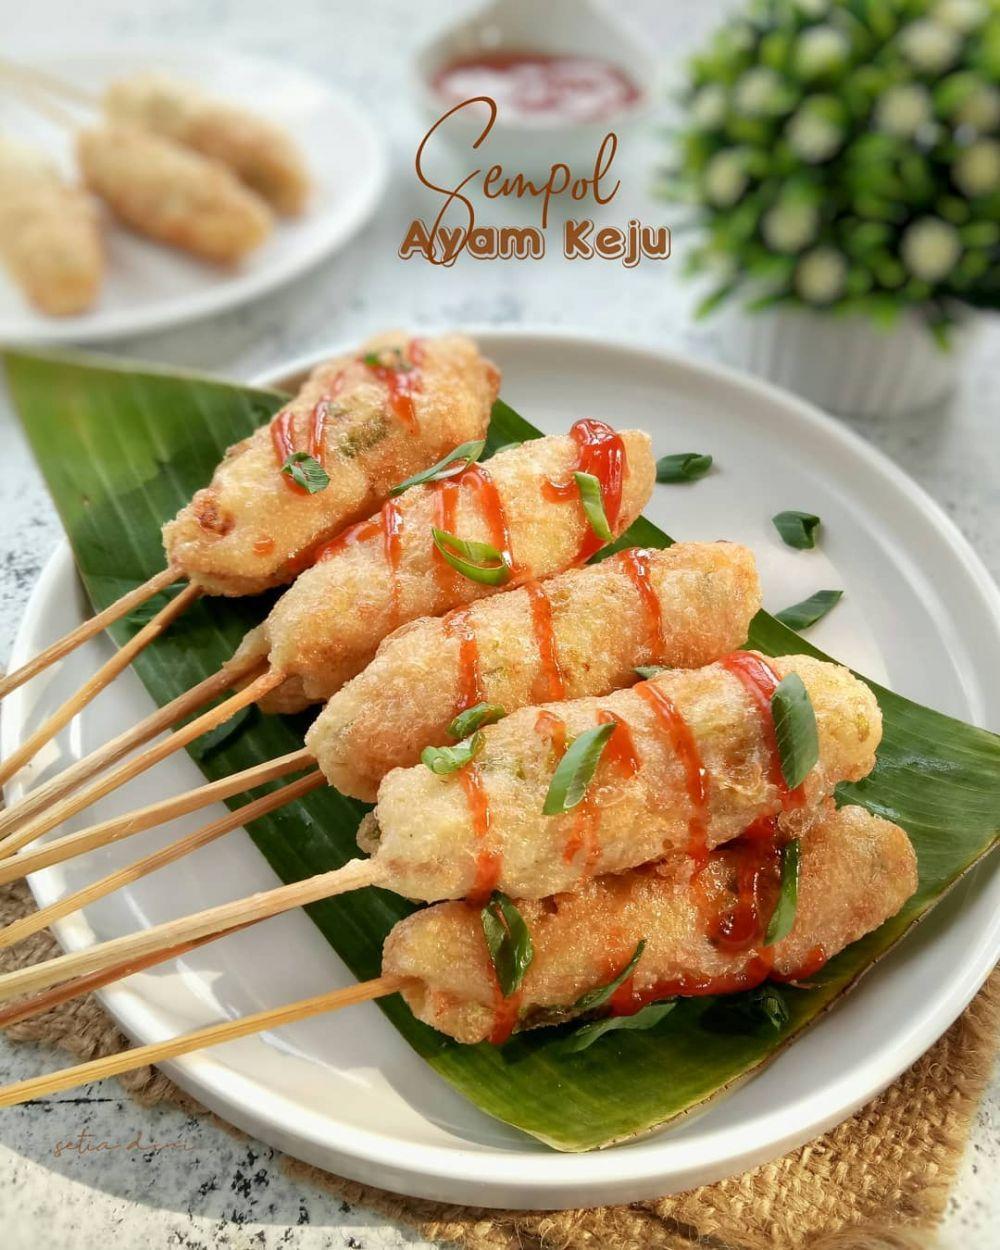 Resep Sempol C 2020 Brilio Net Instagram Rabbit Inthekitchen Instagram Hazhiyahrf Di 2020 Makanan Dan Minuman Resep Makanan Ringan Manis